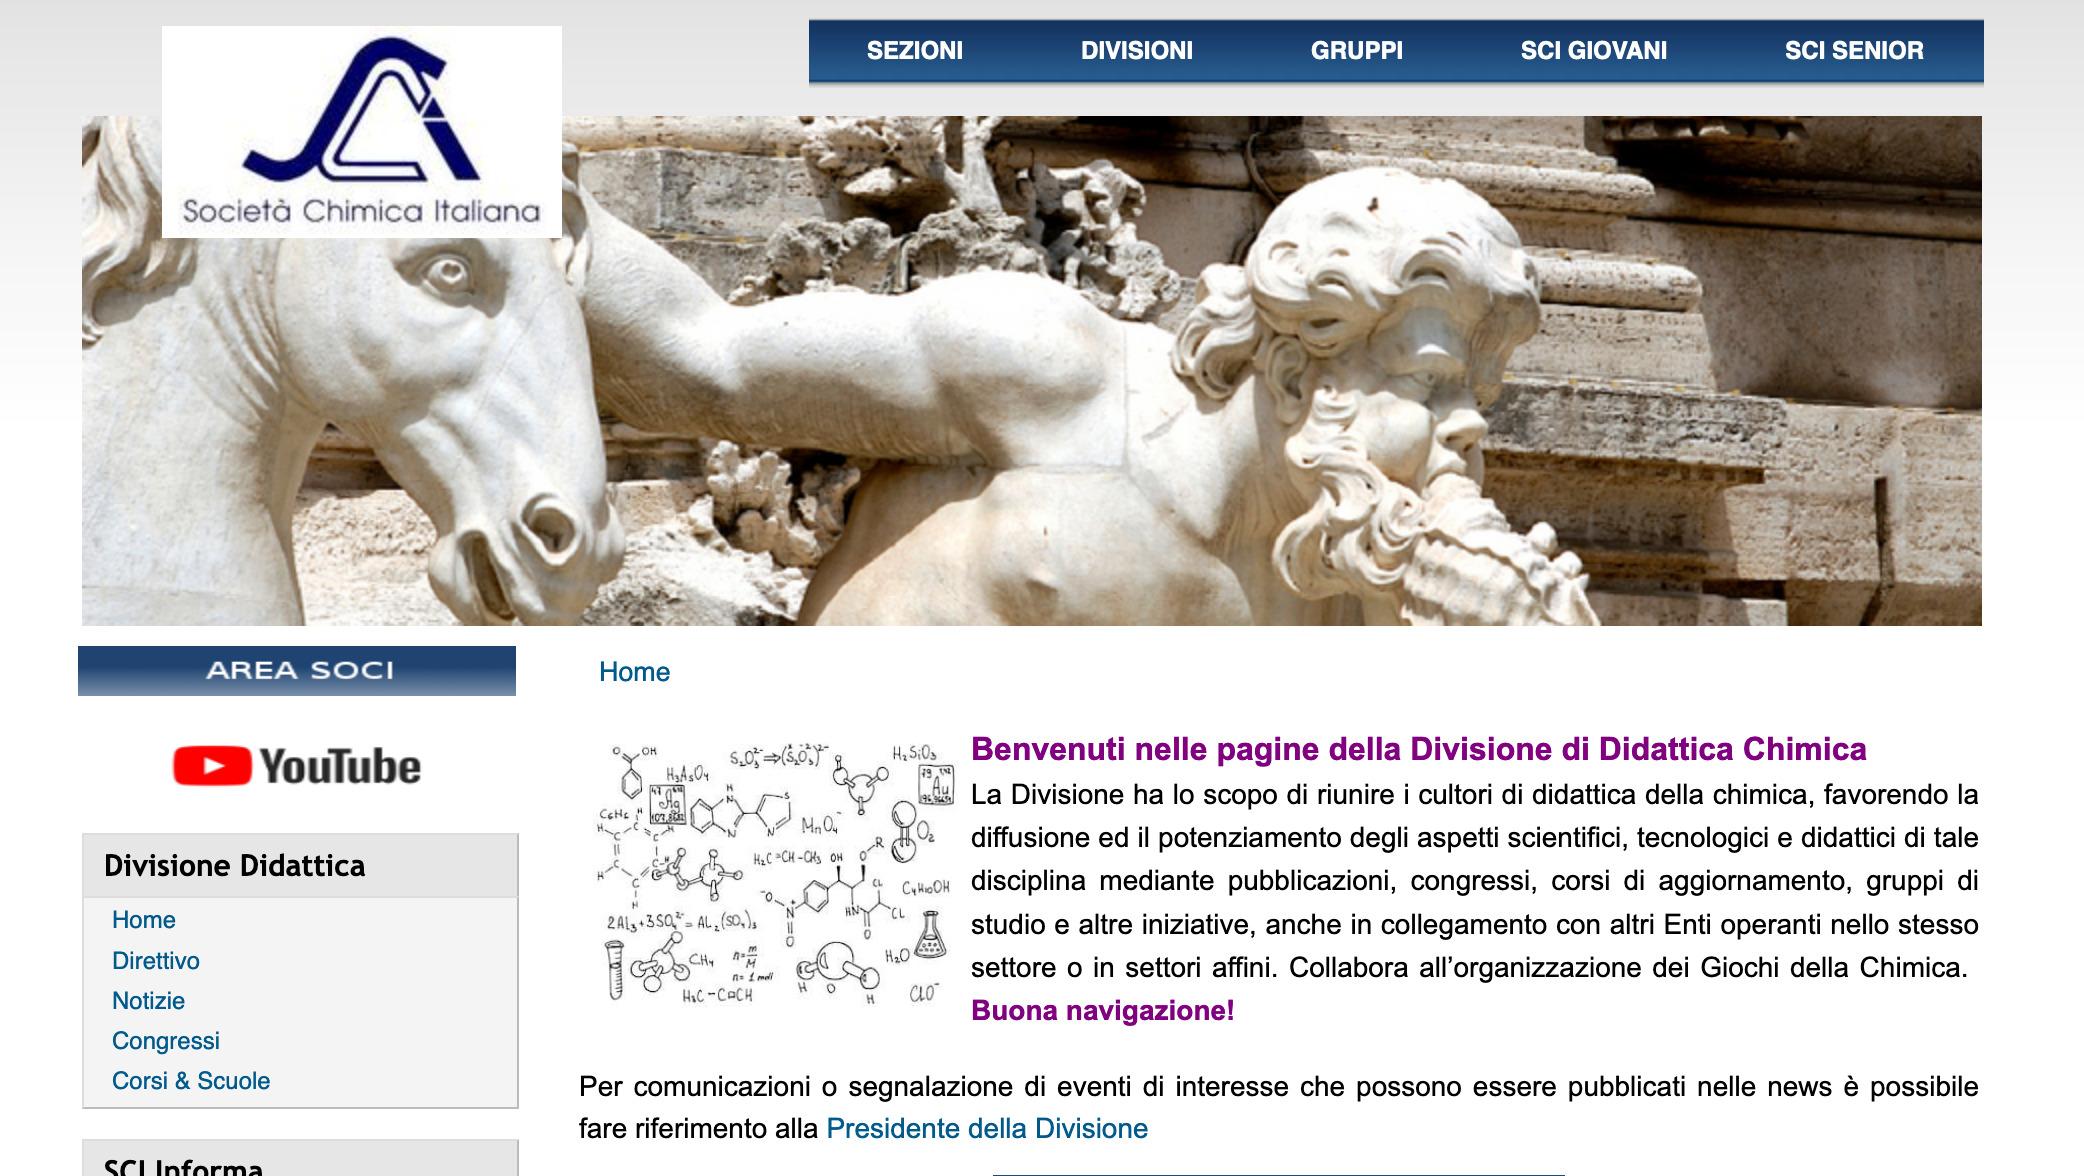 Screenshot_2020-05-02 Home didattica Società Chimica Italiana